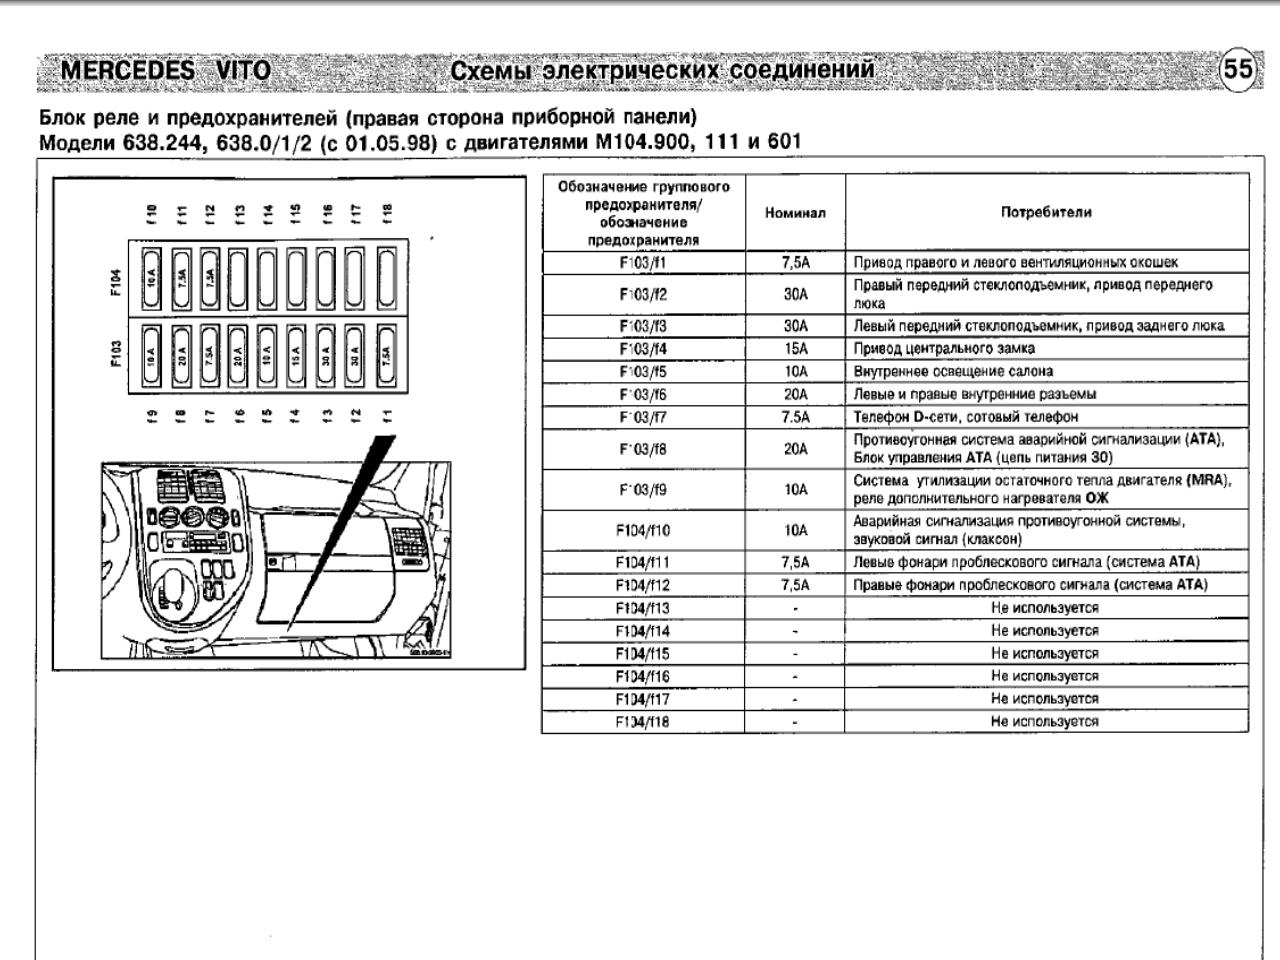 NISSAN SERENA SLX C-23 95г